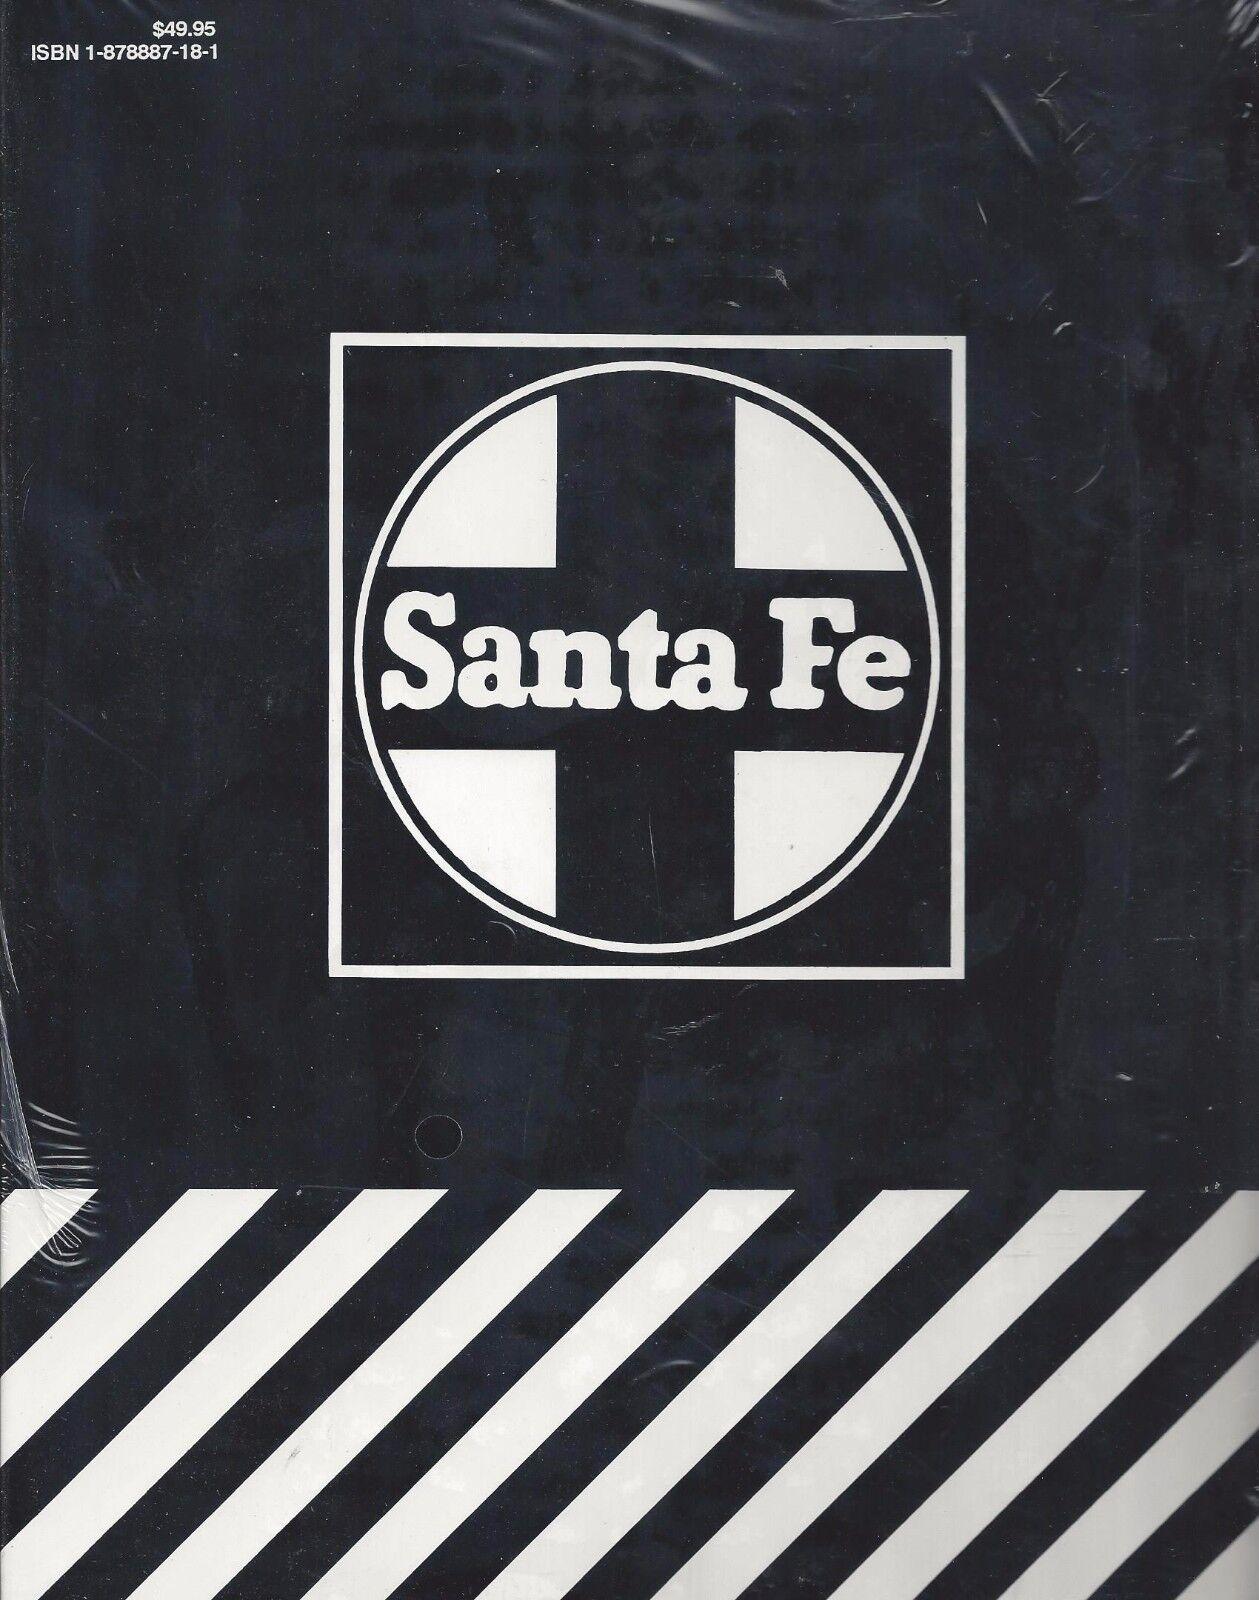 Santa Fe in Coloreeee, Coloreeee, Coloreeee, 1940-1971, Vol. 2 - Kansas città - Albuquerque ( Nuovo Libro a2b9b8